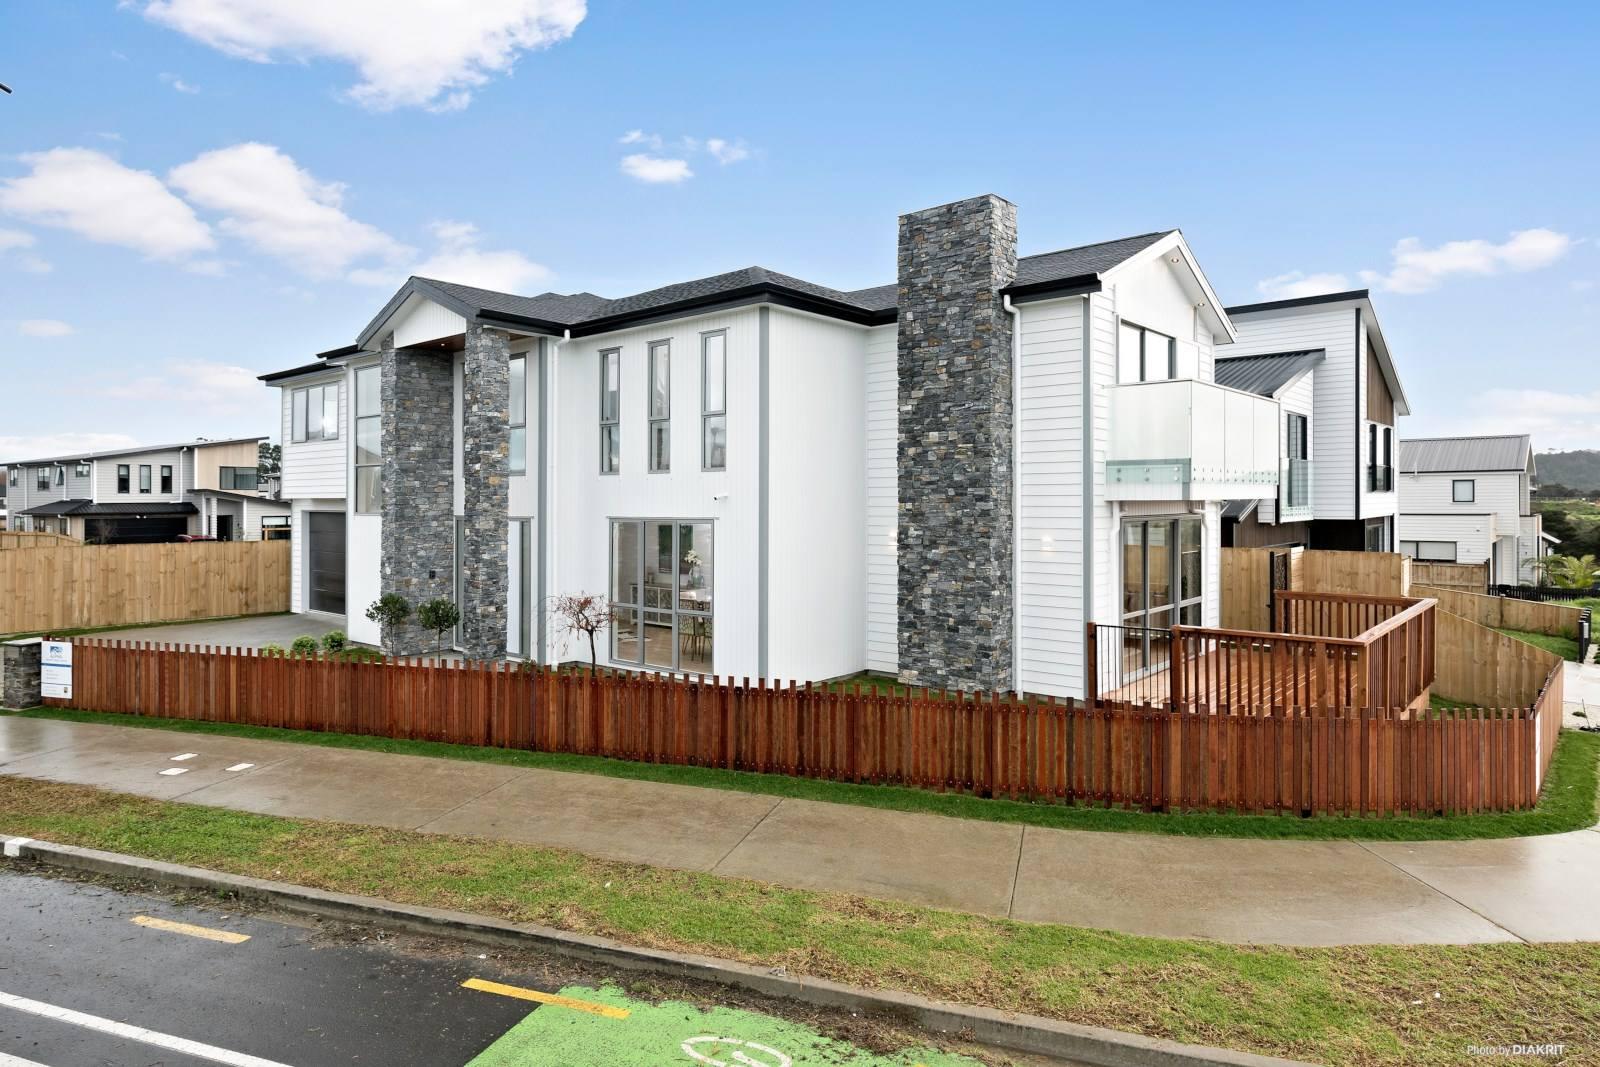 Hobsonville 5房 全新品质奢居 布局宽敞 注重细节 10年质保+10分校网 交通无比便捷 百闻不如一见! Luxurious, Spacious, Brand New Home